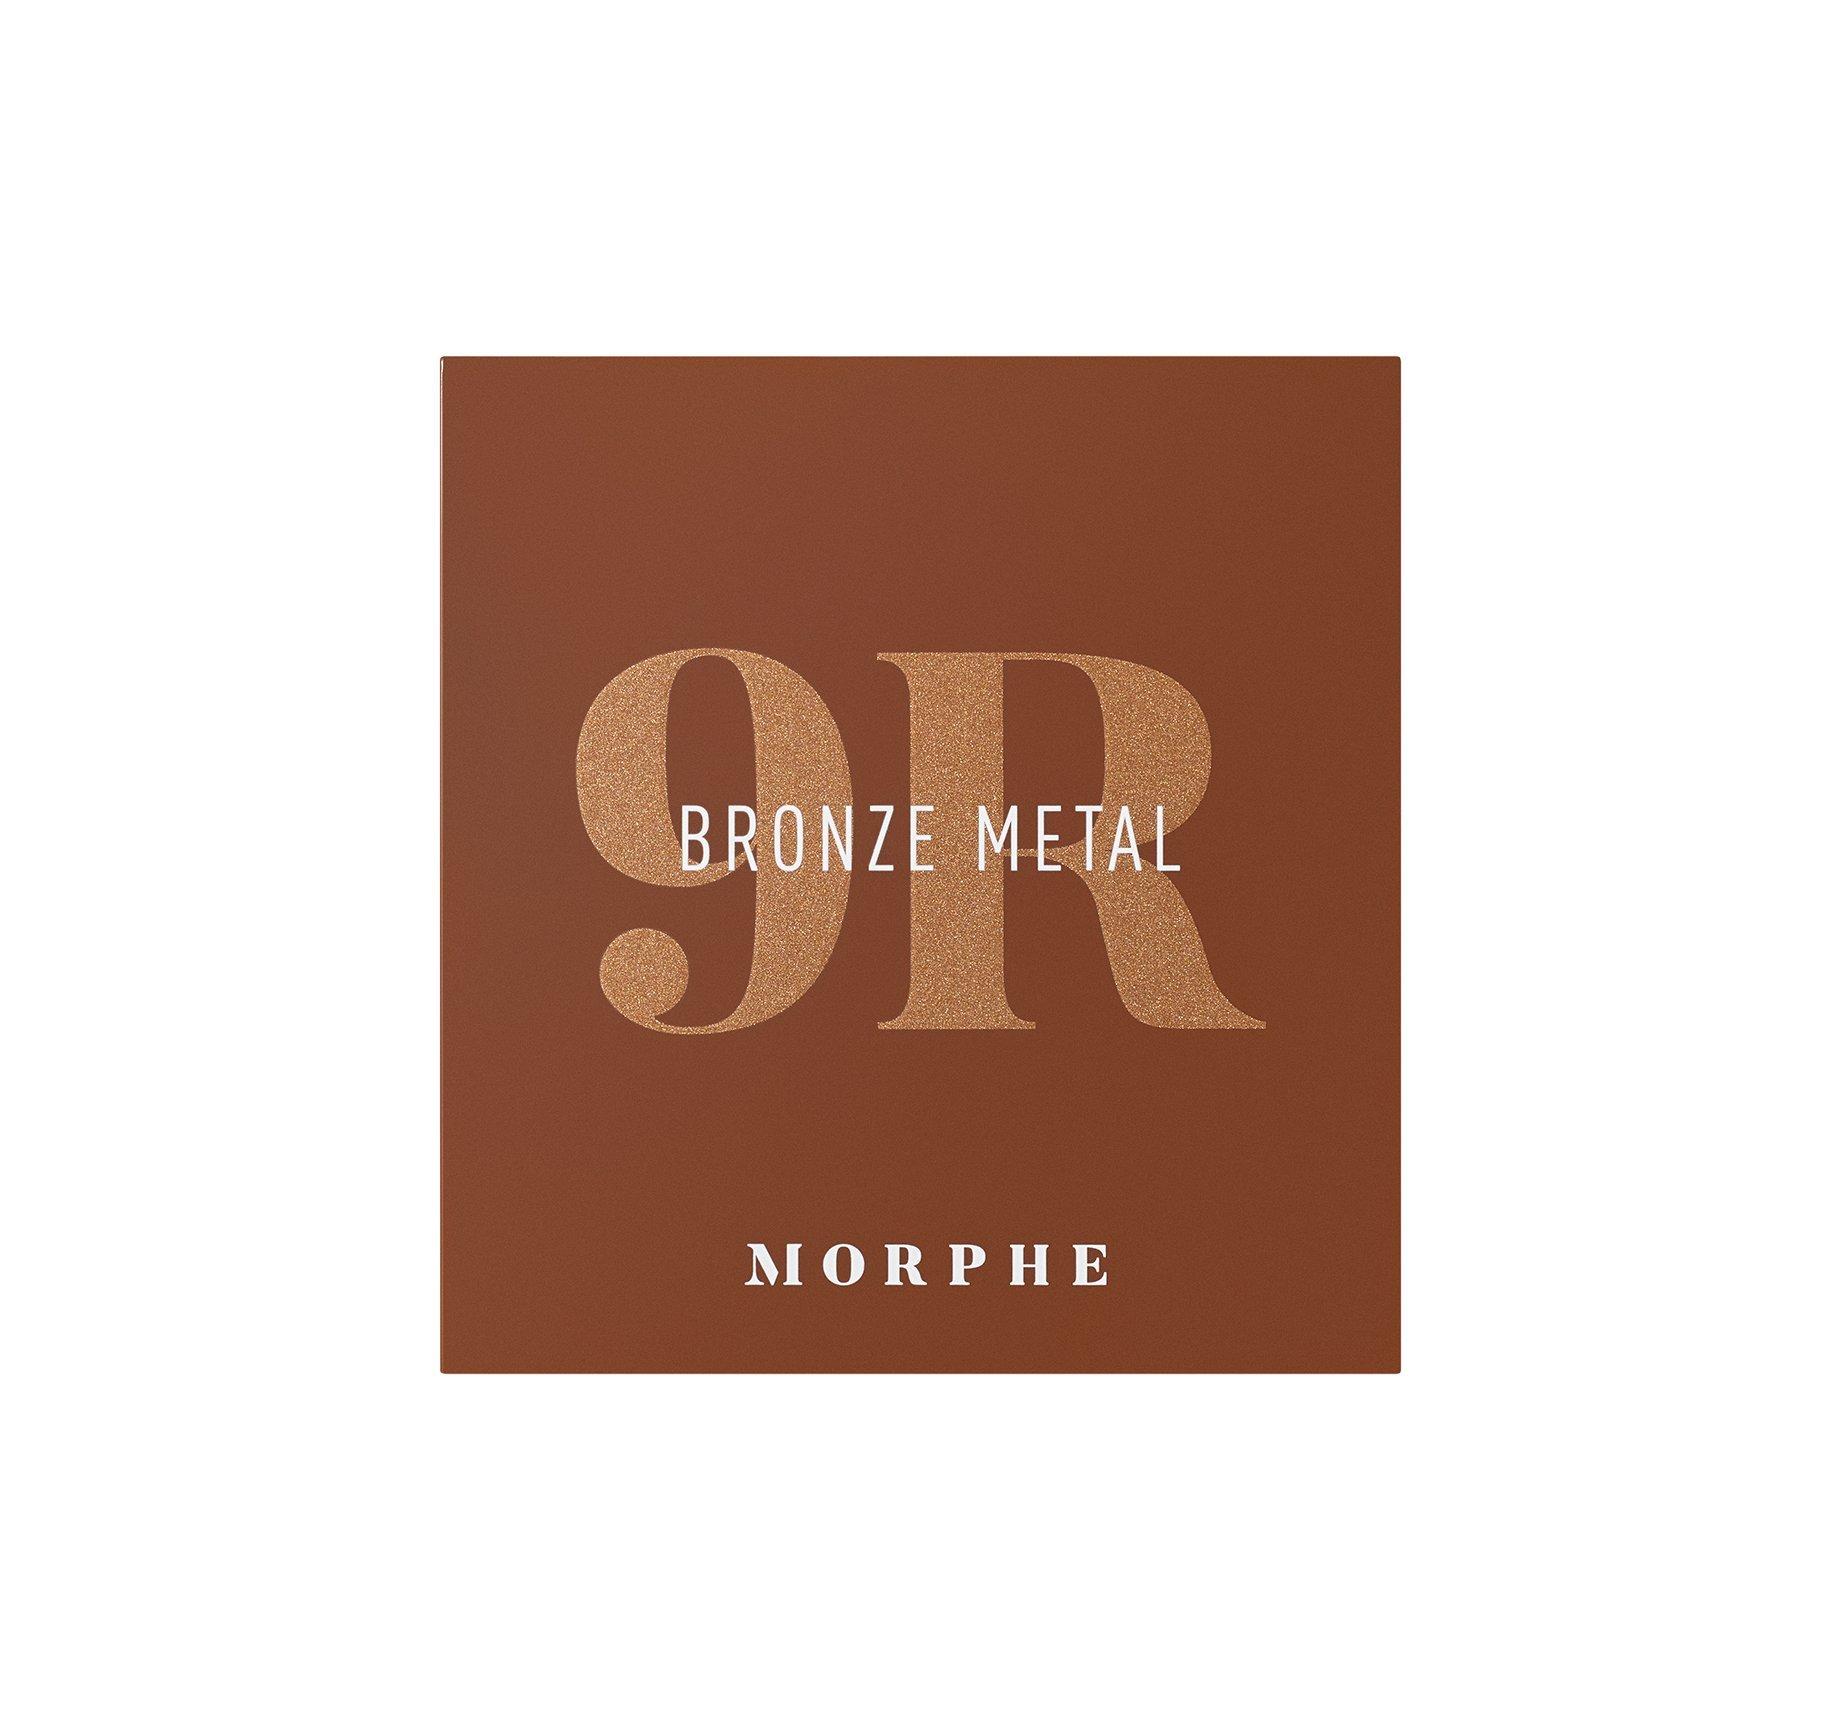 Morphe 9R Bronze Metal Artistry Palette